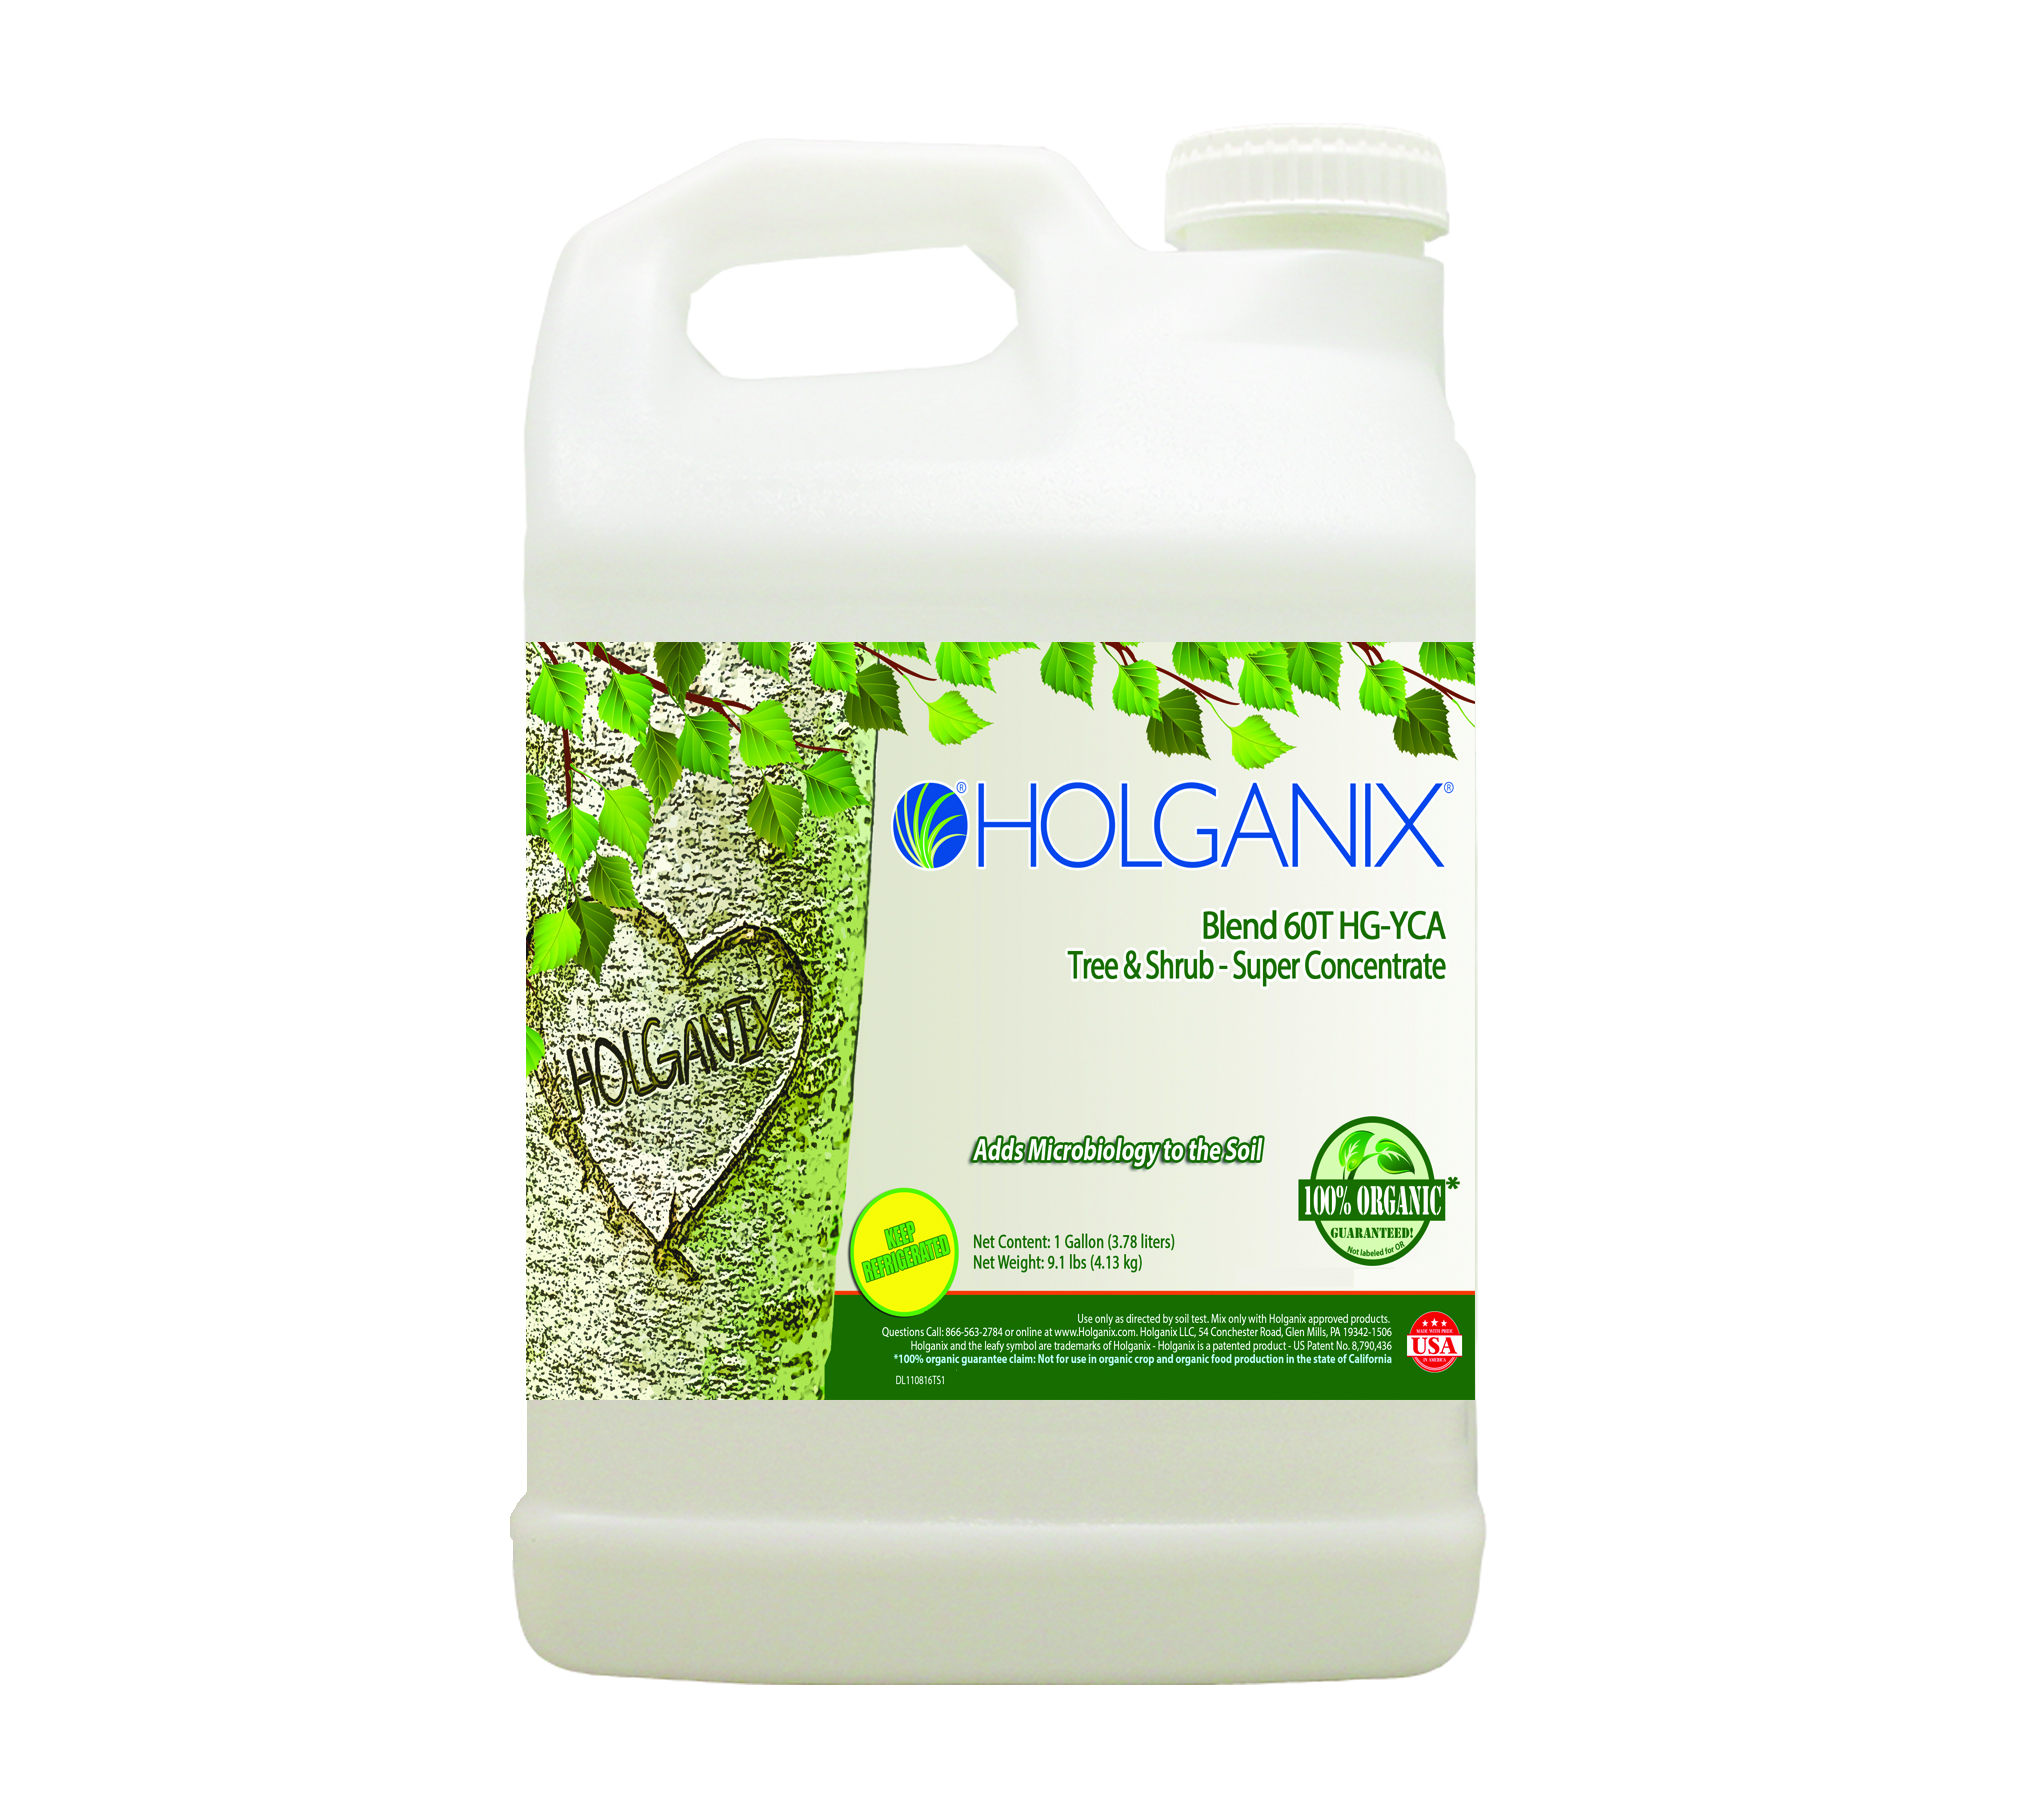 Holganix Tree & Shrub